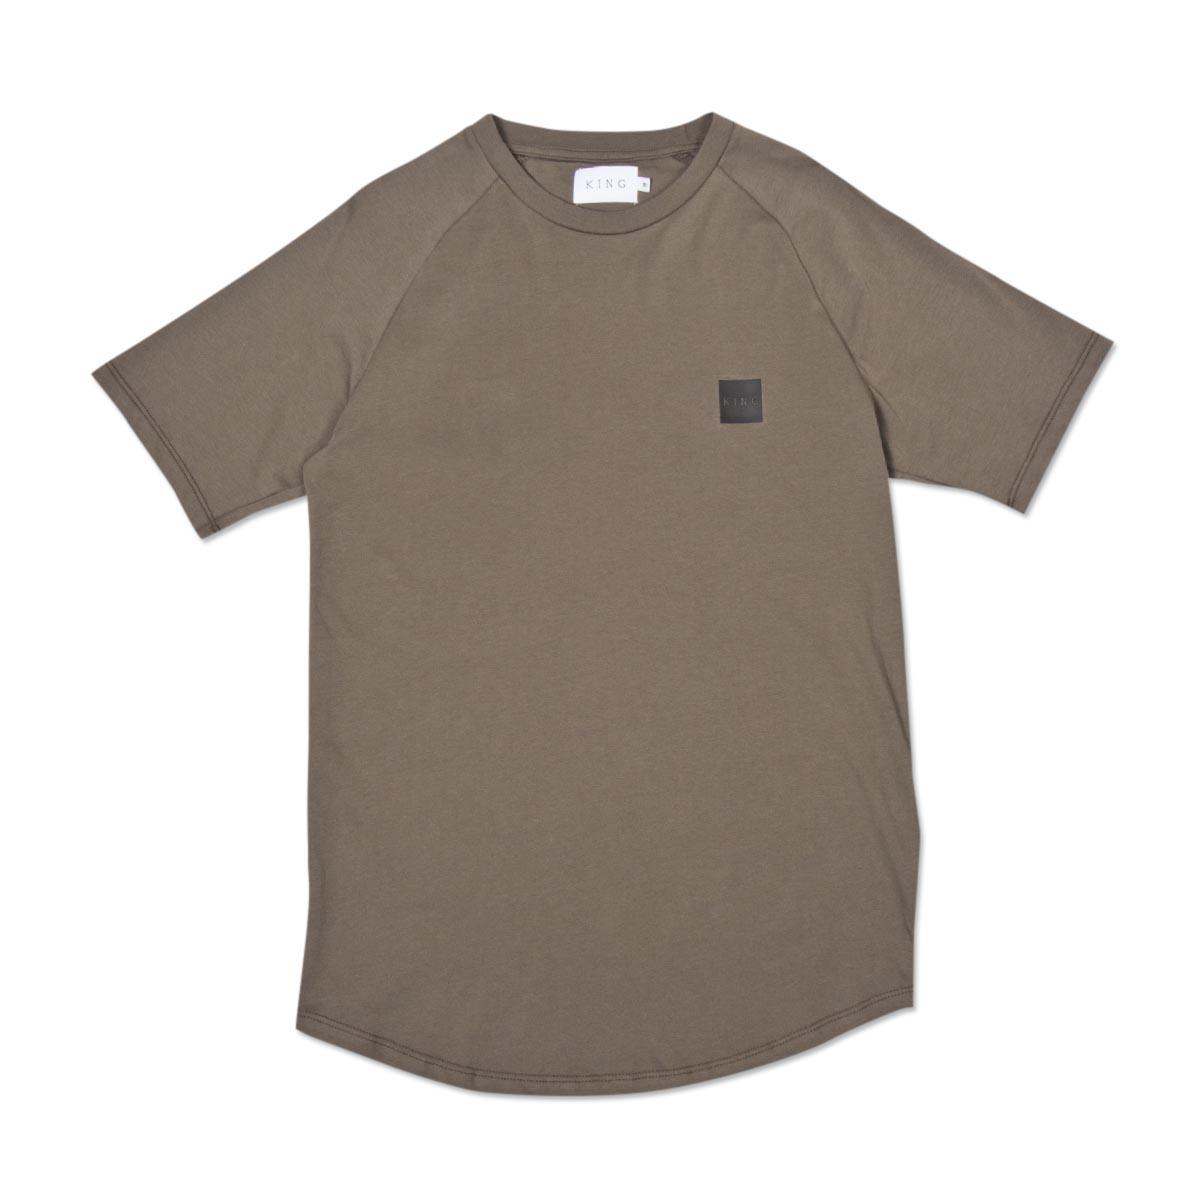 King ApparelSelect PRM T-shirt - Fern - M